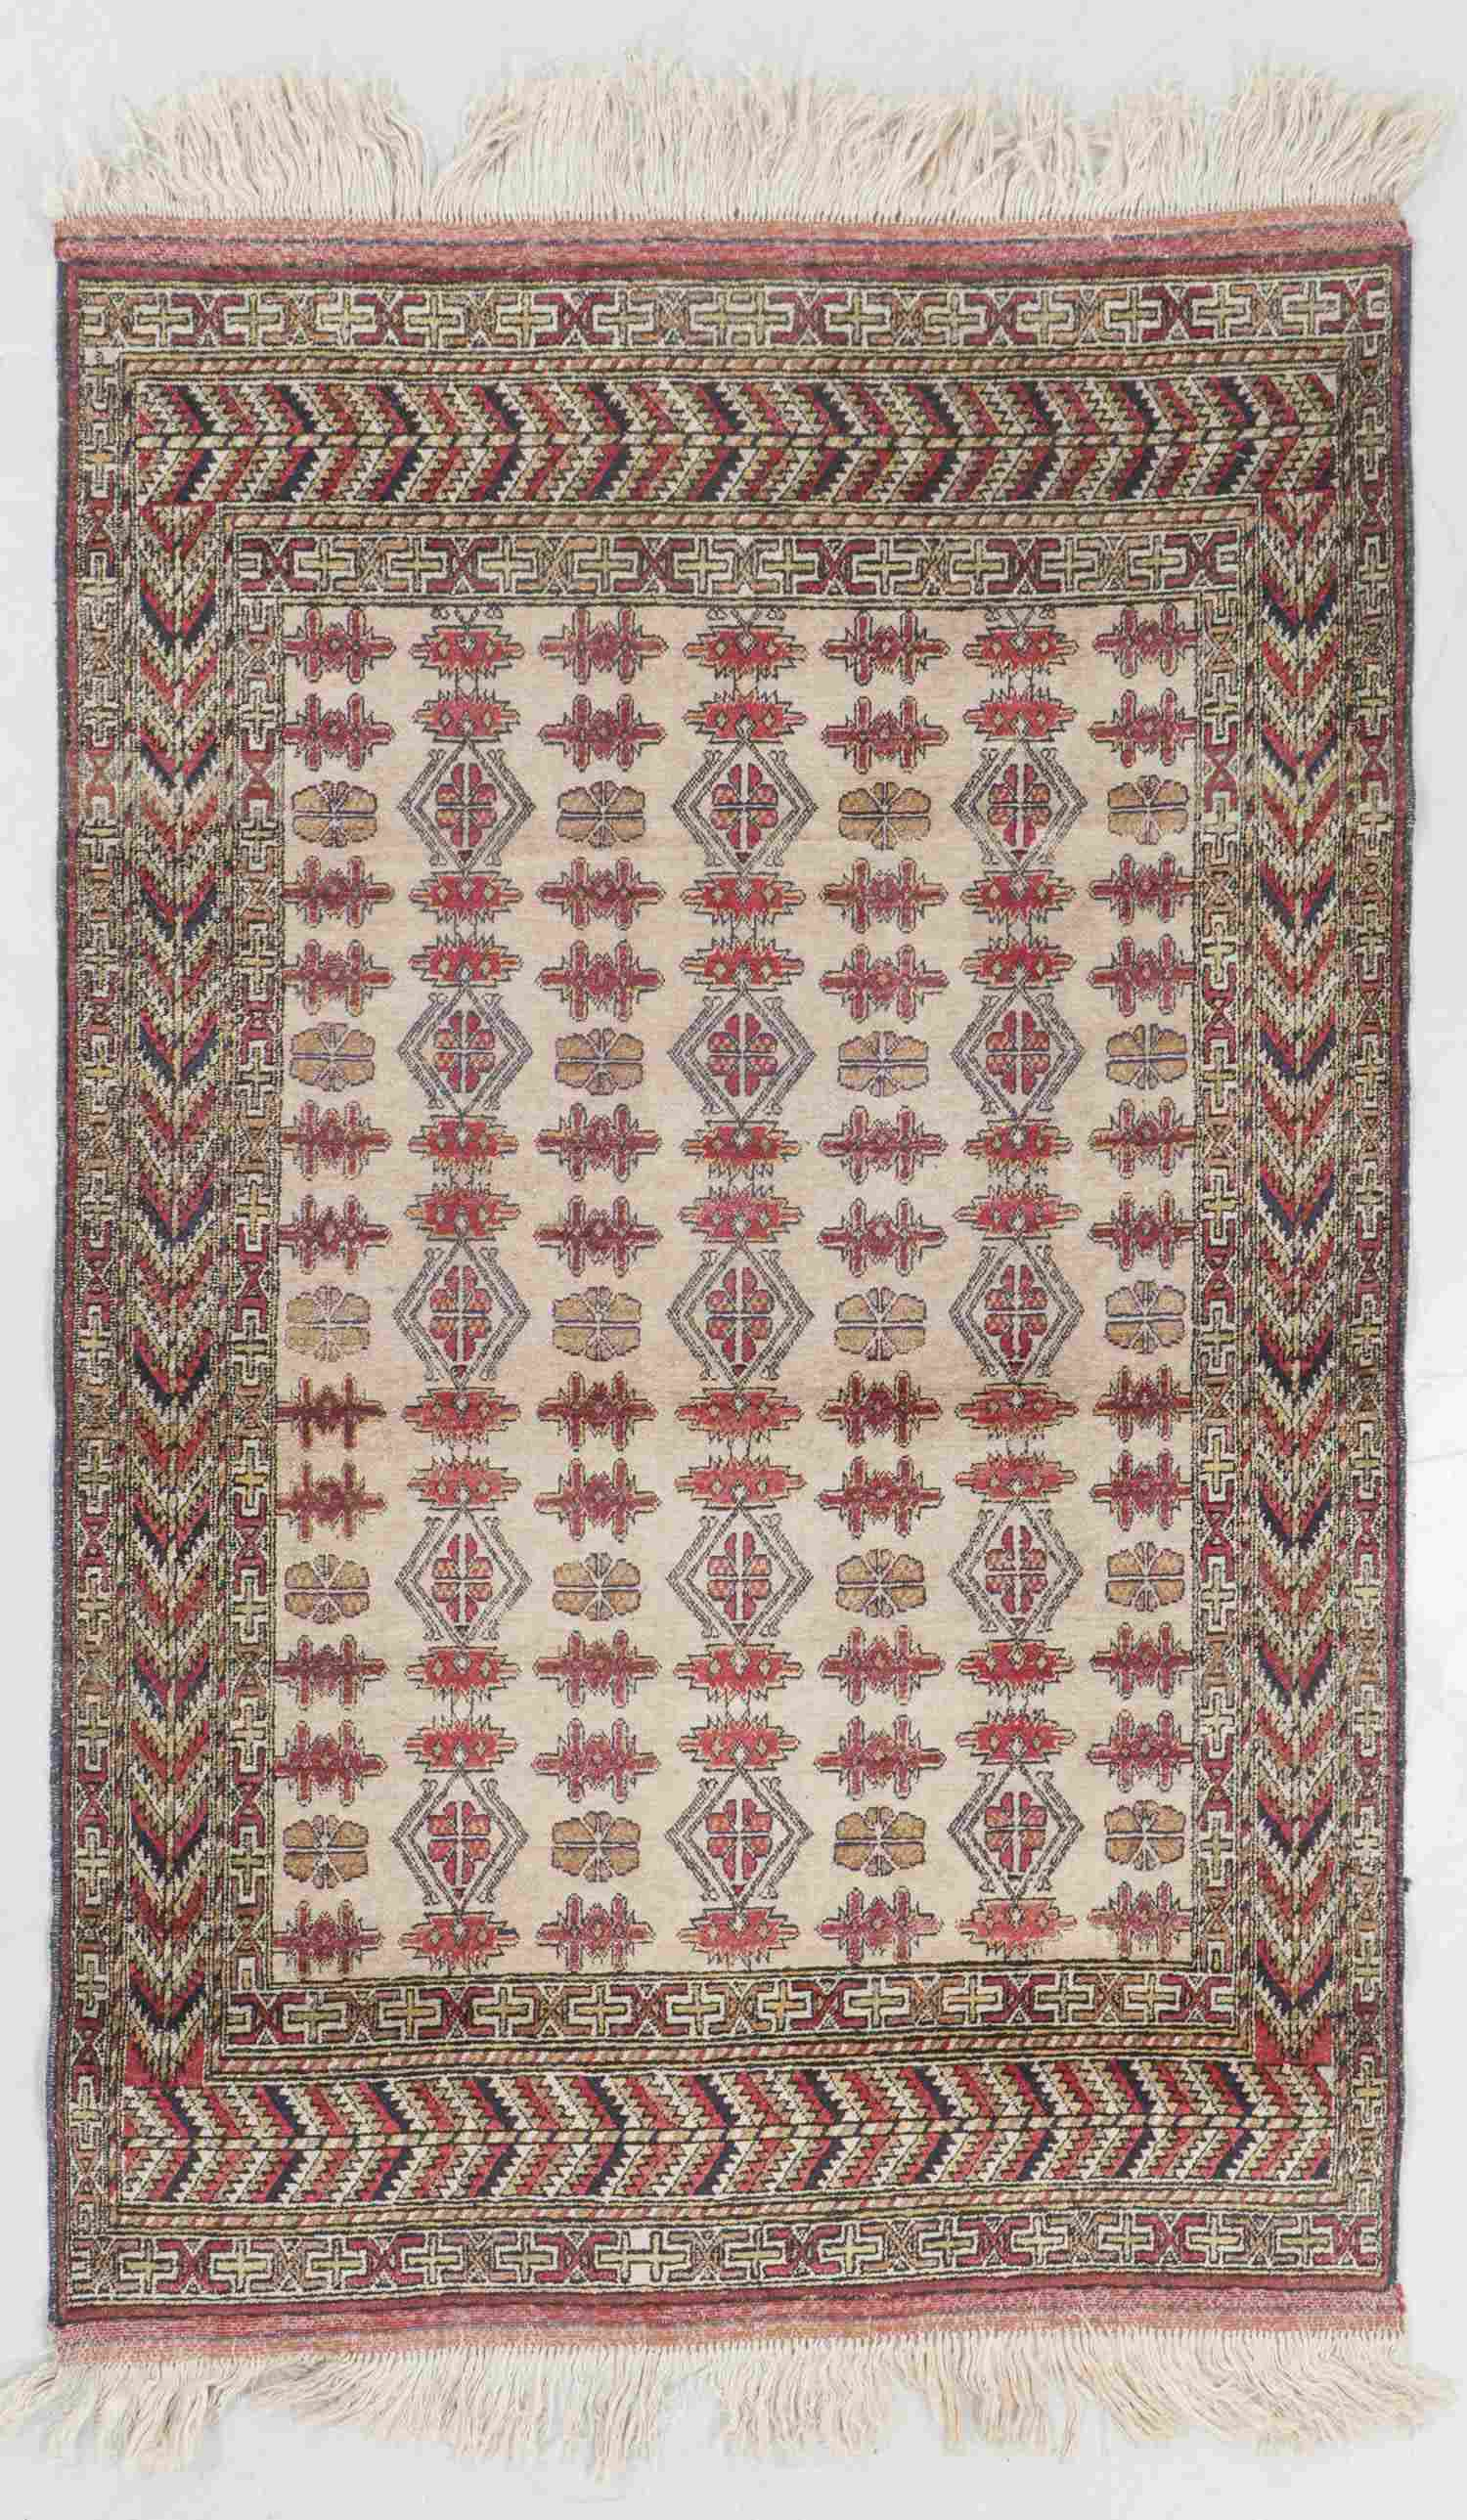 Vintage Central Asian Rug, Turkmenistan: 3'11'' x 6'1''